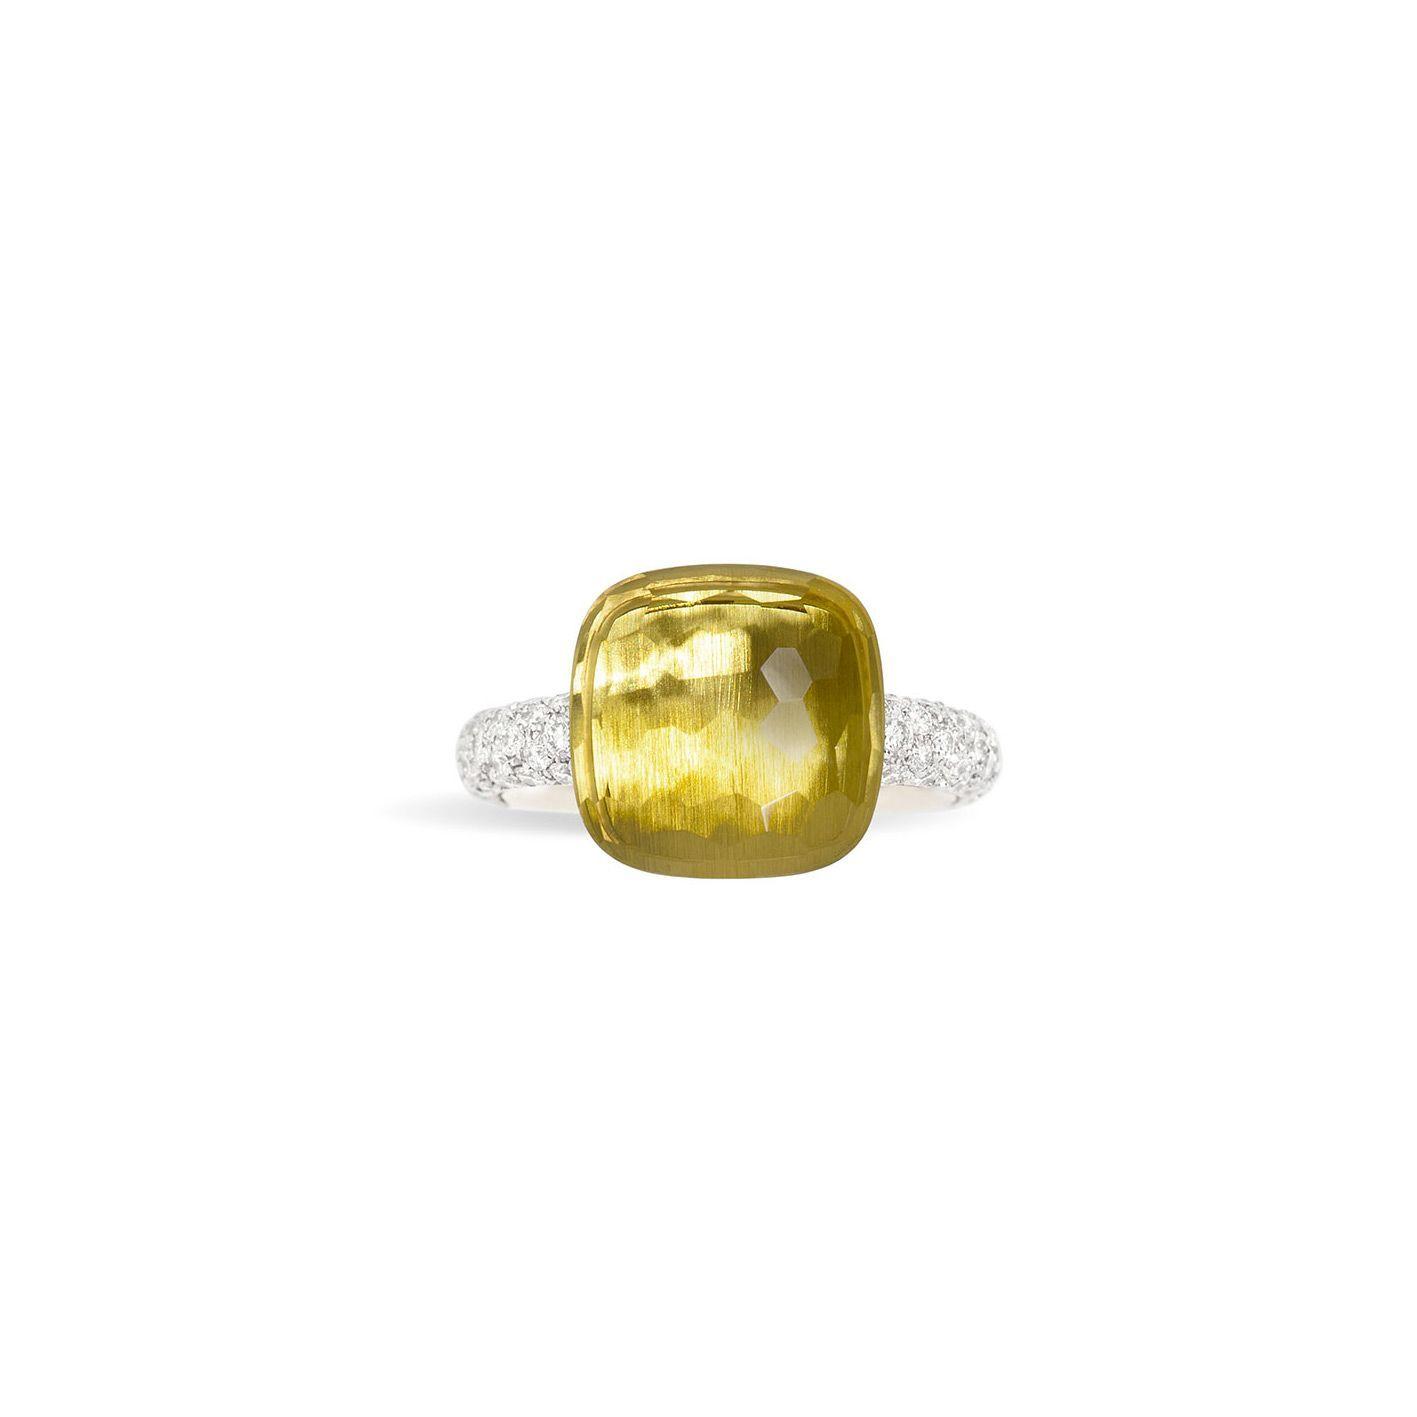 Bague Pomellato Nudo en Or rose, or blanc, Diamant et quartz vue 3